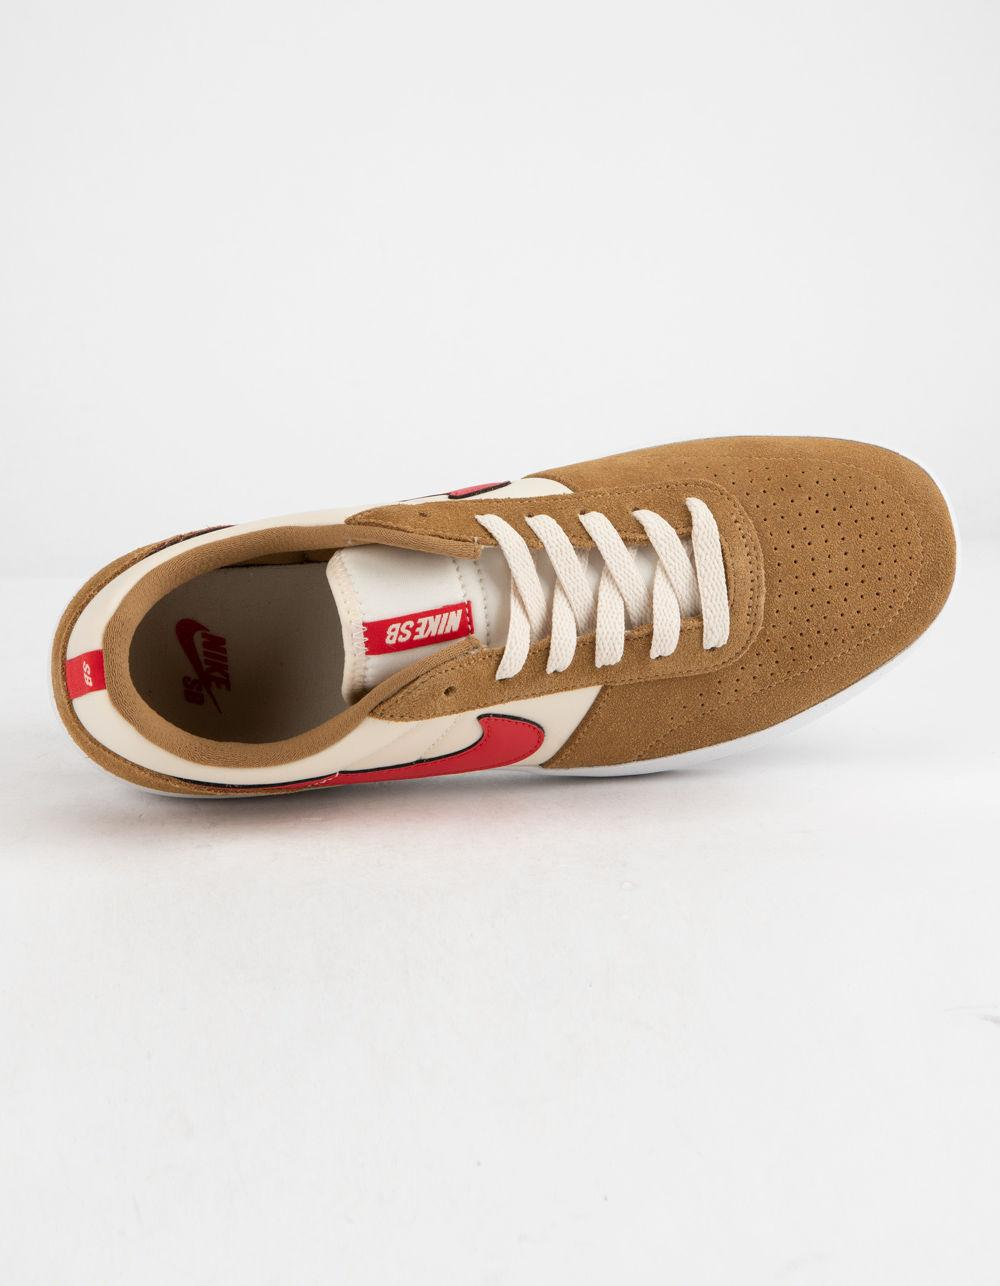 e9fb8e819d625 Lyst - Nike Team Classic Golden Beige & University Red Mens Shoes ...